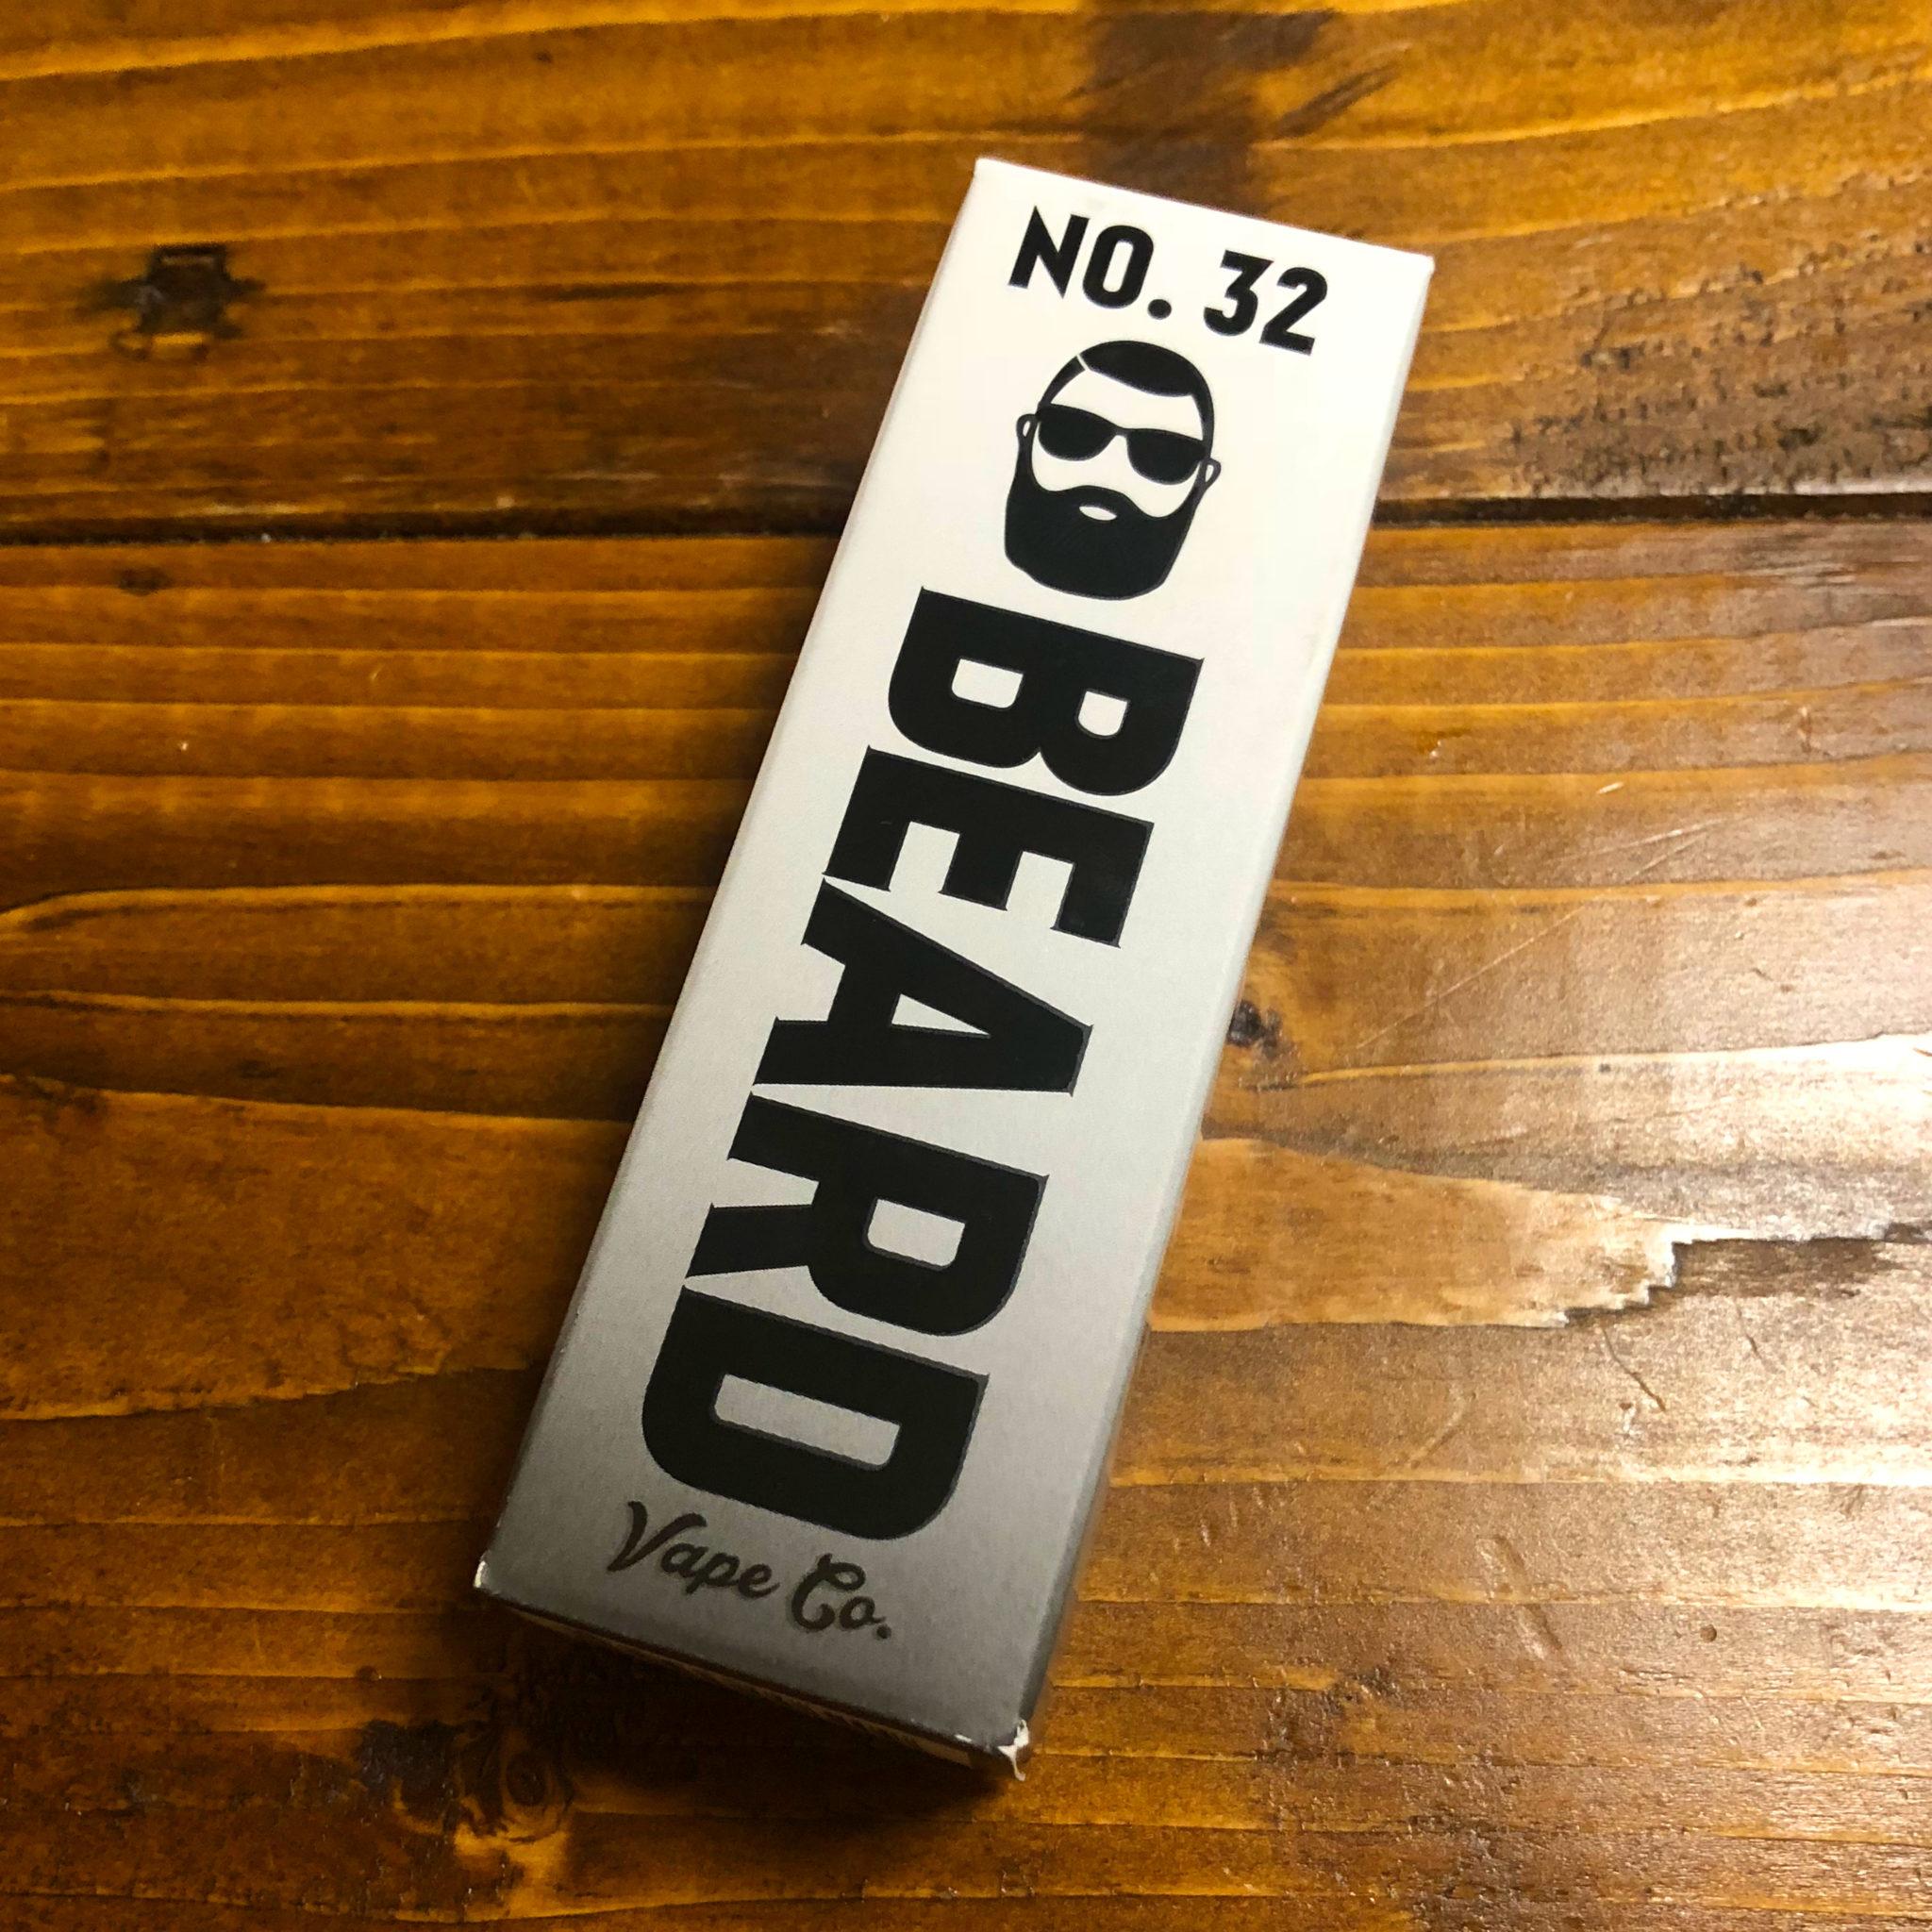 VP2 - 【レビュー】シナモン好きに贈る Beard Vape Co. 「No.32(ナンバー32)」~女子も好きなはず。スタメン入り確定のおやつ系リキッド~